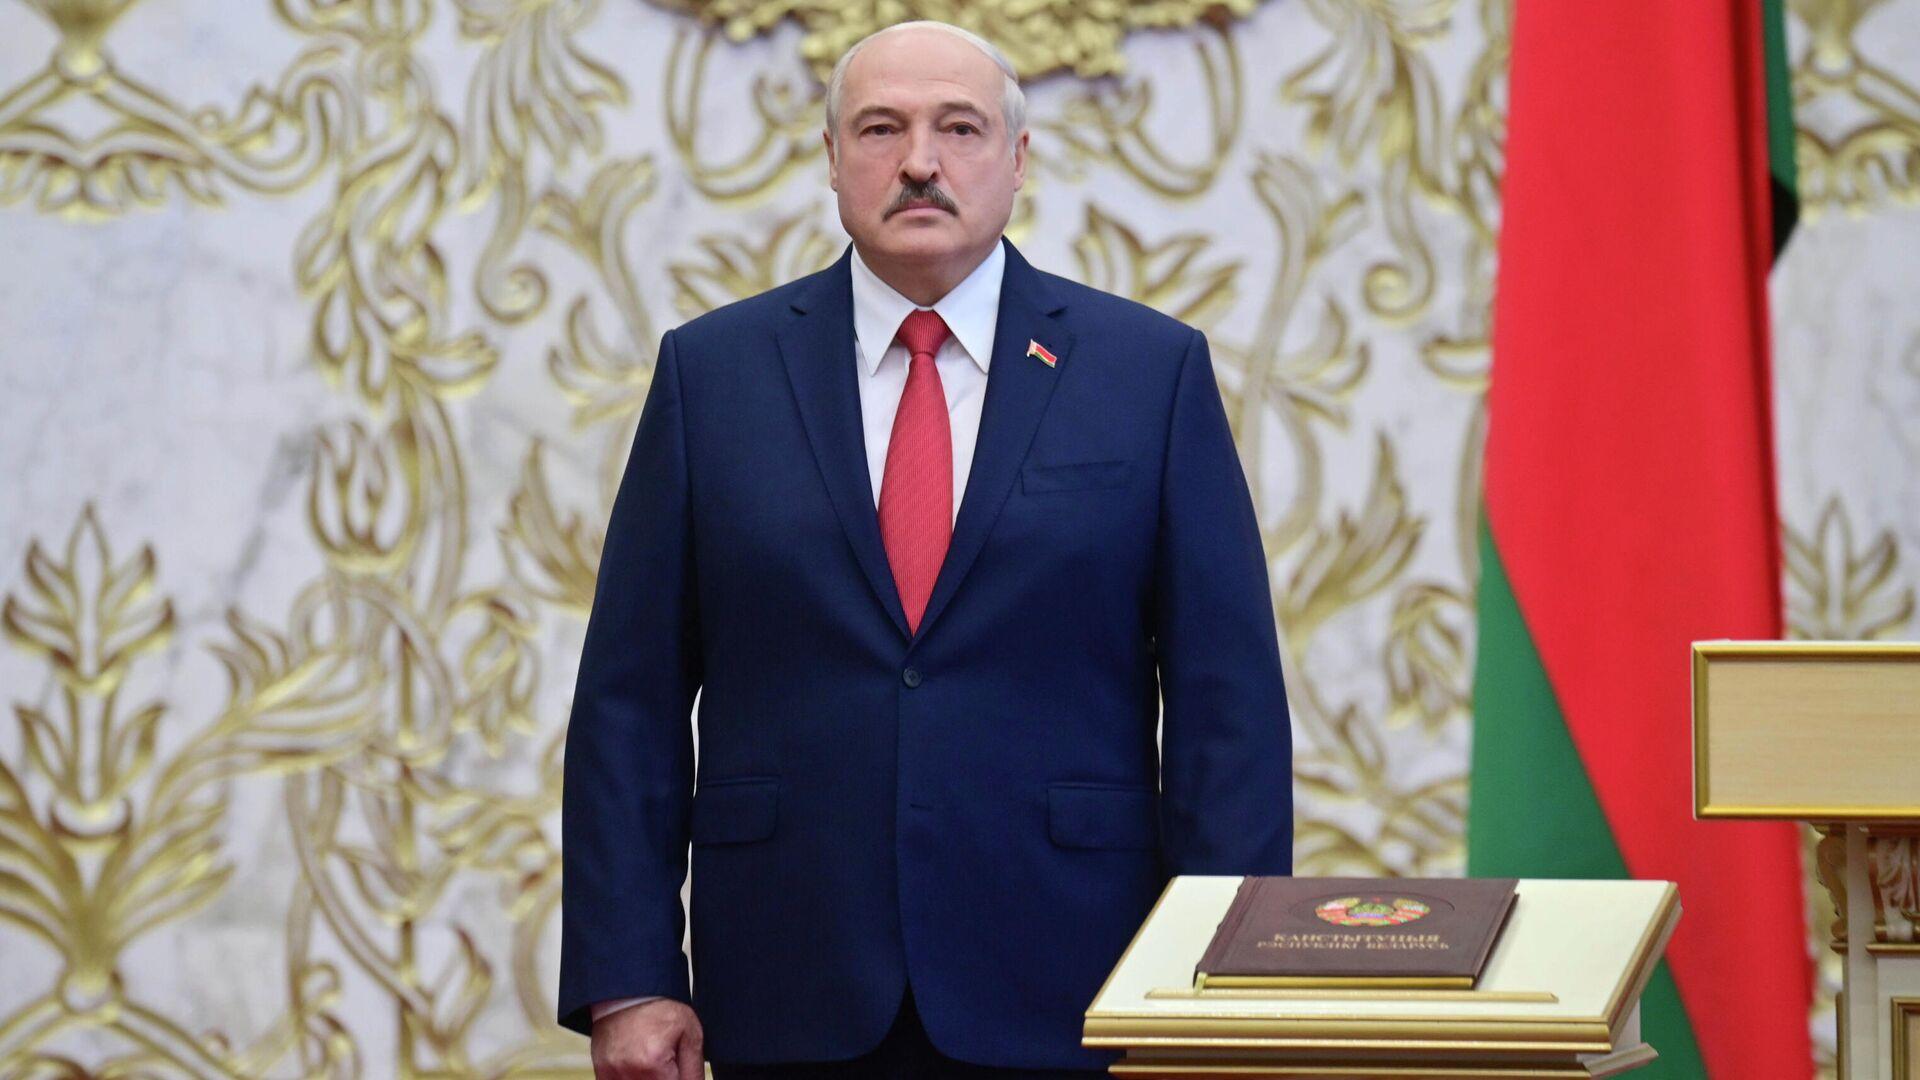 Президент Белоруссии Александр Лукашенко на церемонии инаугурации в Минске - РИА Новости, 1920, 29.01.2021